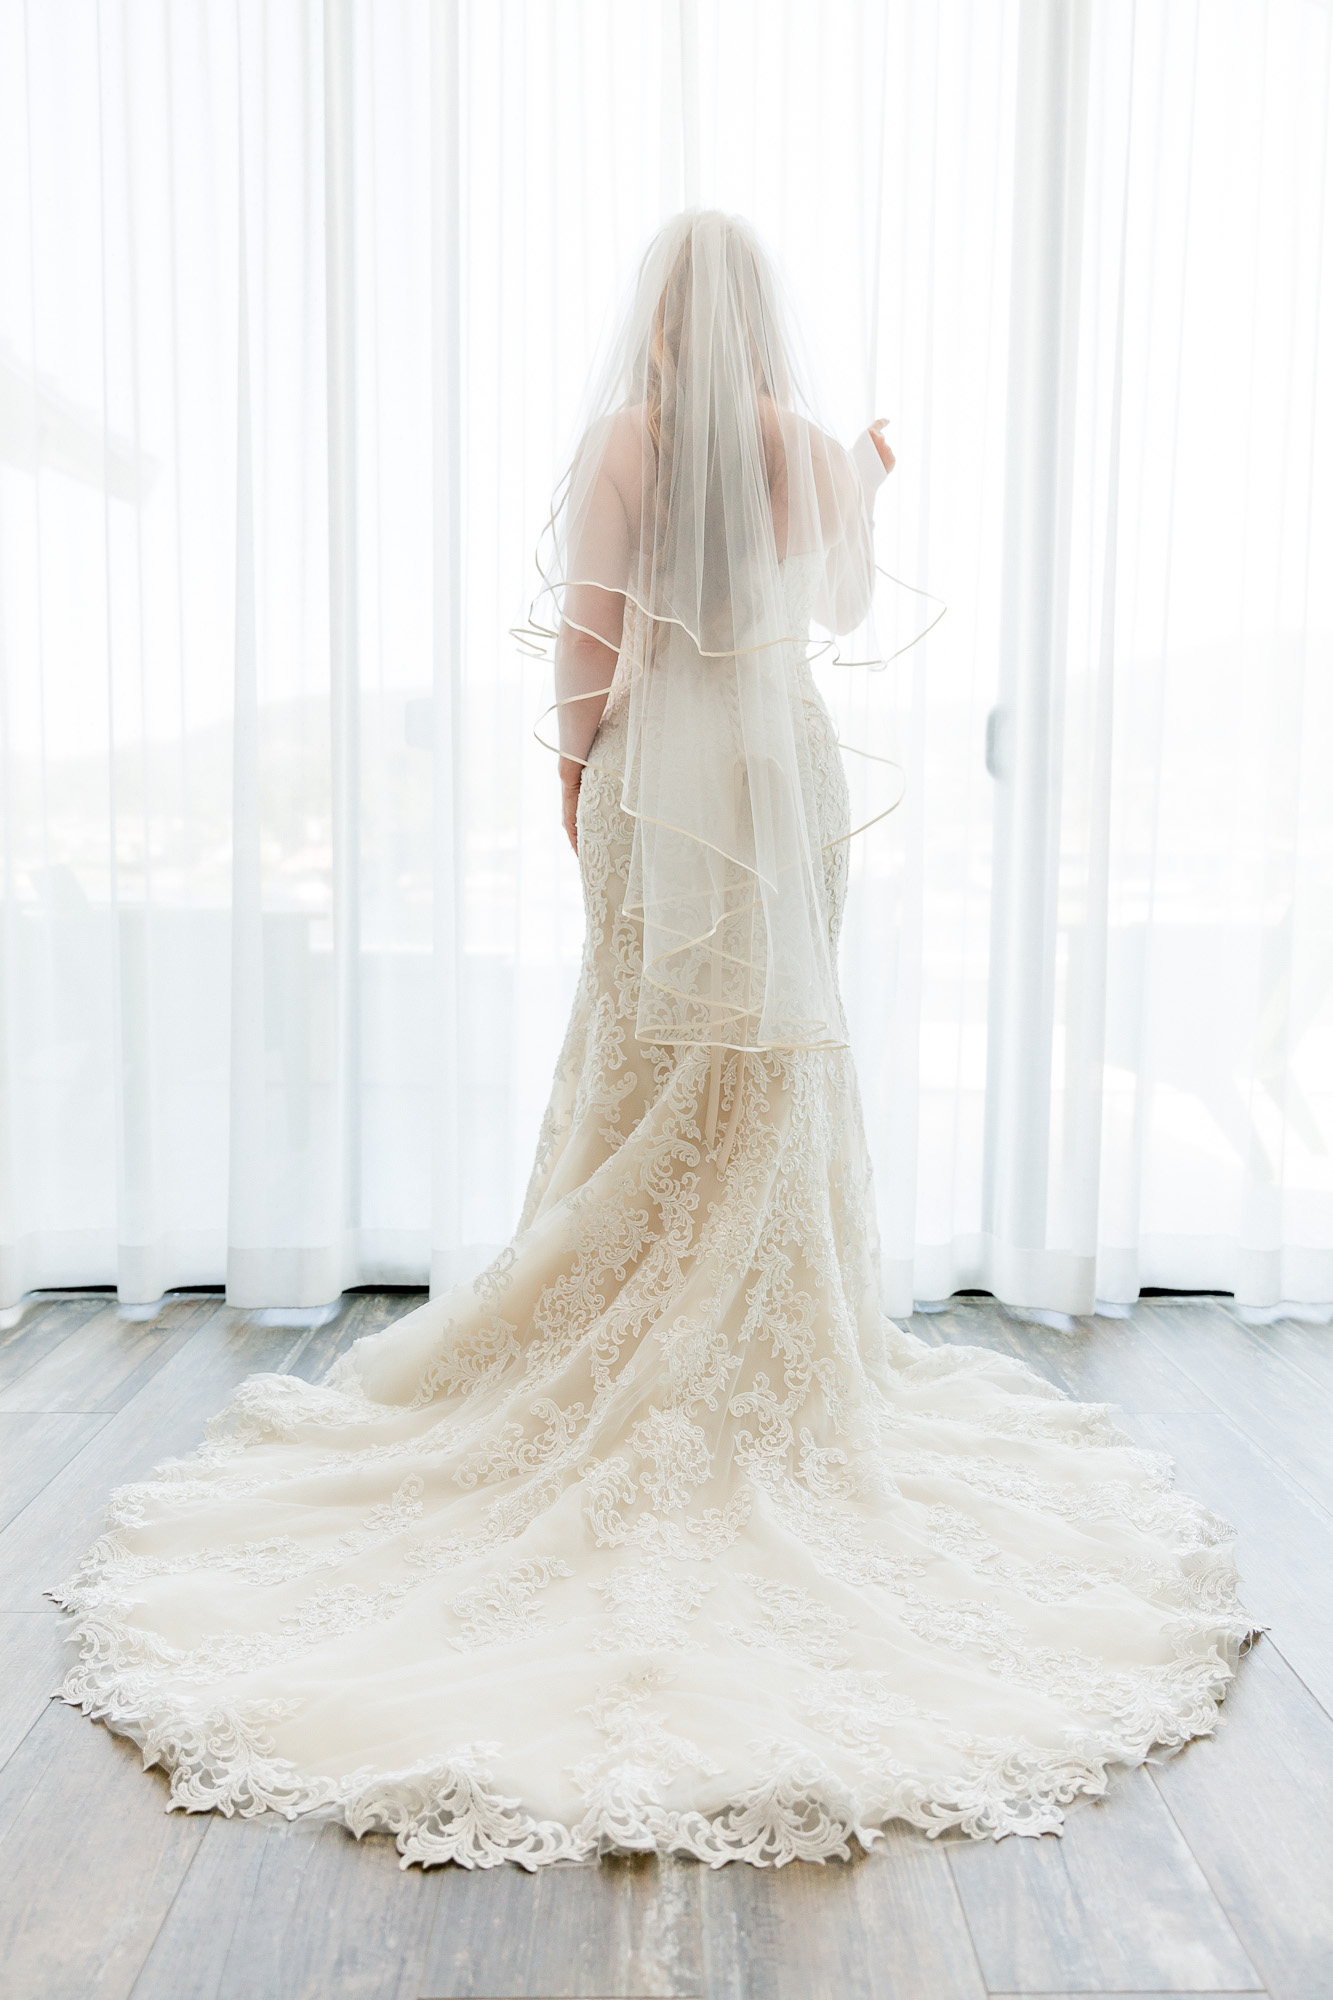 Heather_Pat_San_Marcos_Lakehouse_Wedding_145.jpg